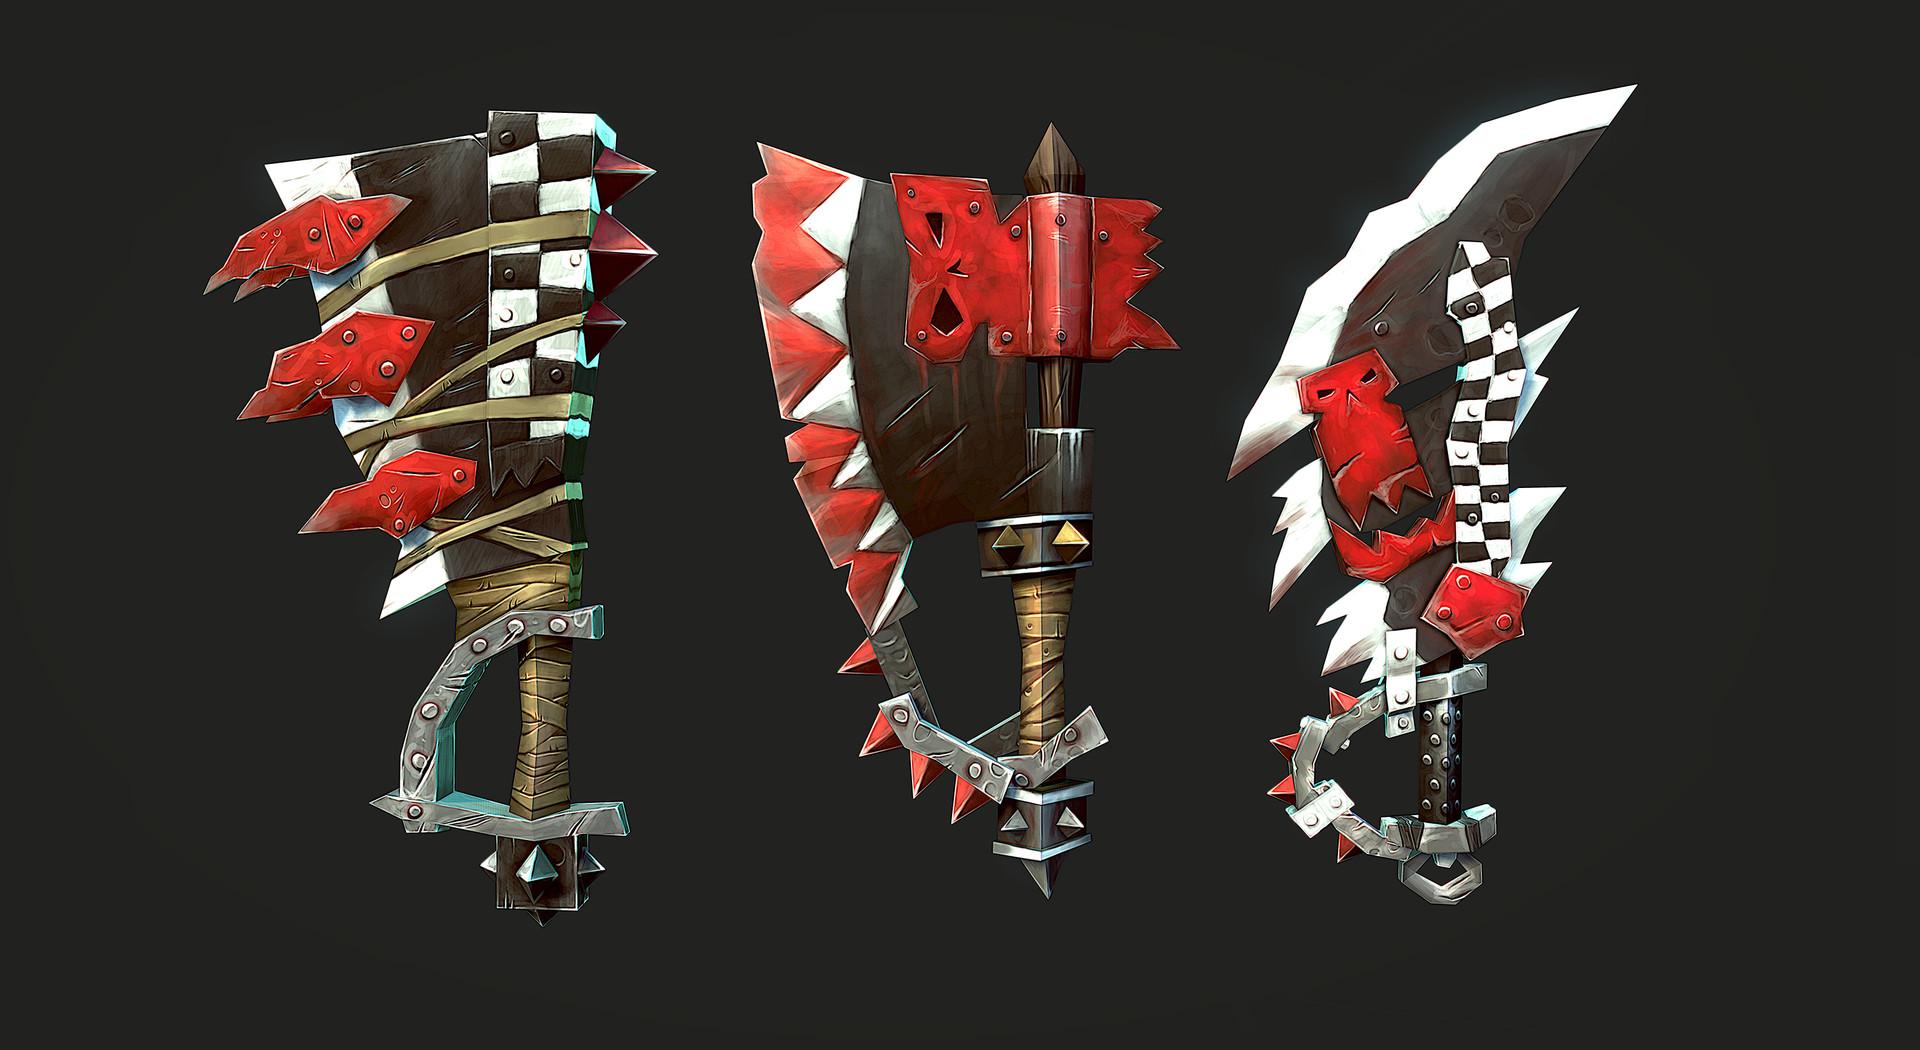 Eren ozel warhammerweapons 20 04dec13 1920x1080